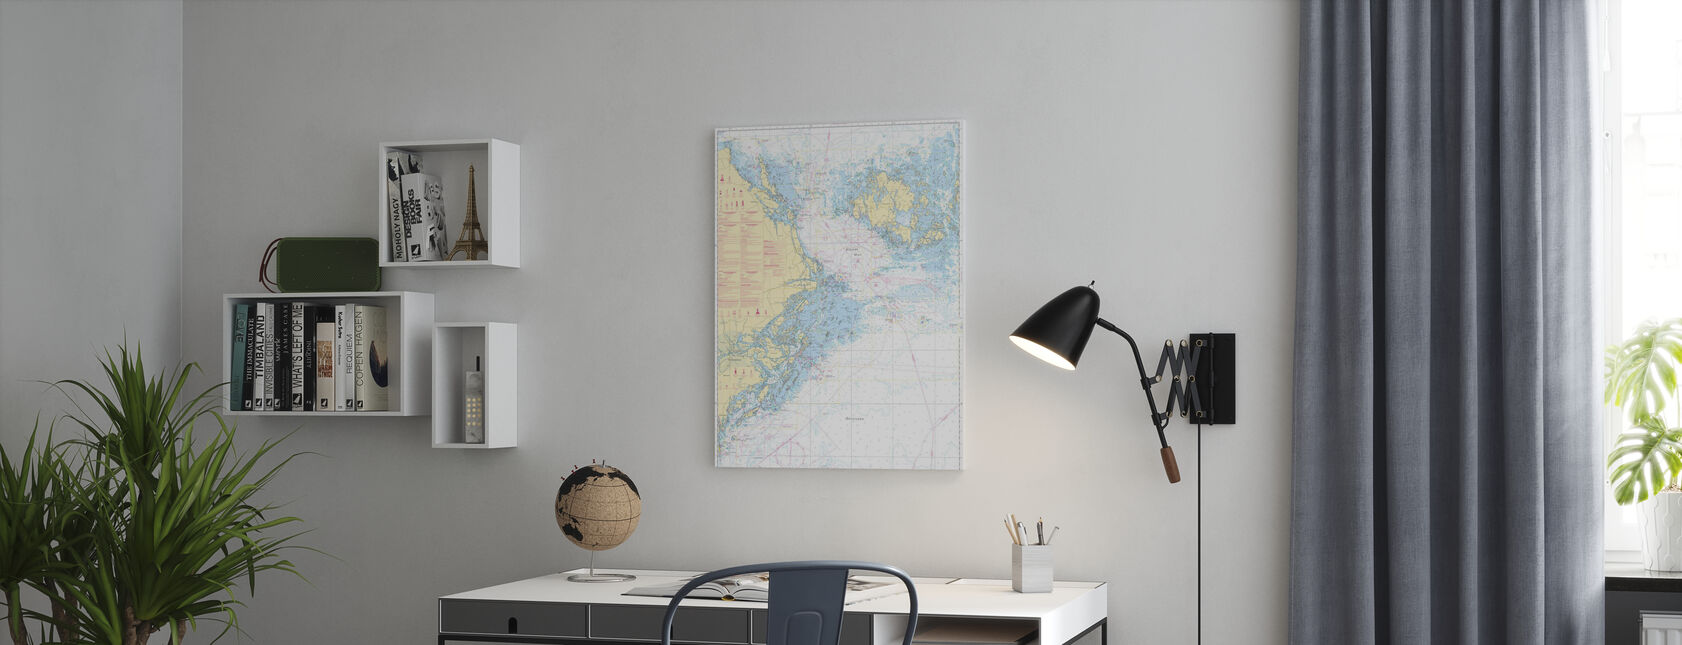 Havsdiagram 61 - Landsort - Alands Hav - Canvastavla - Kontor